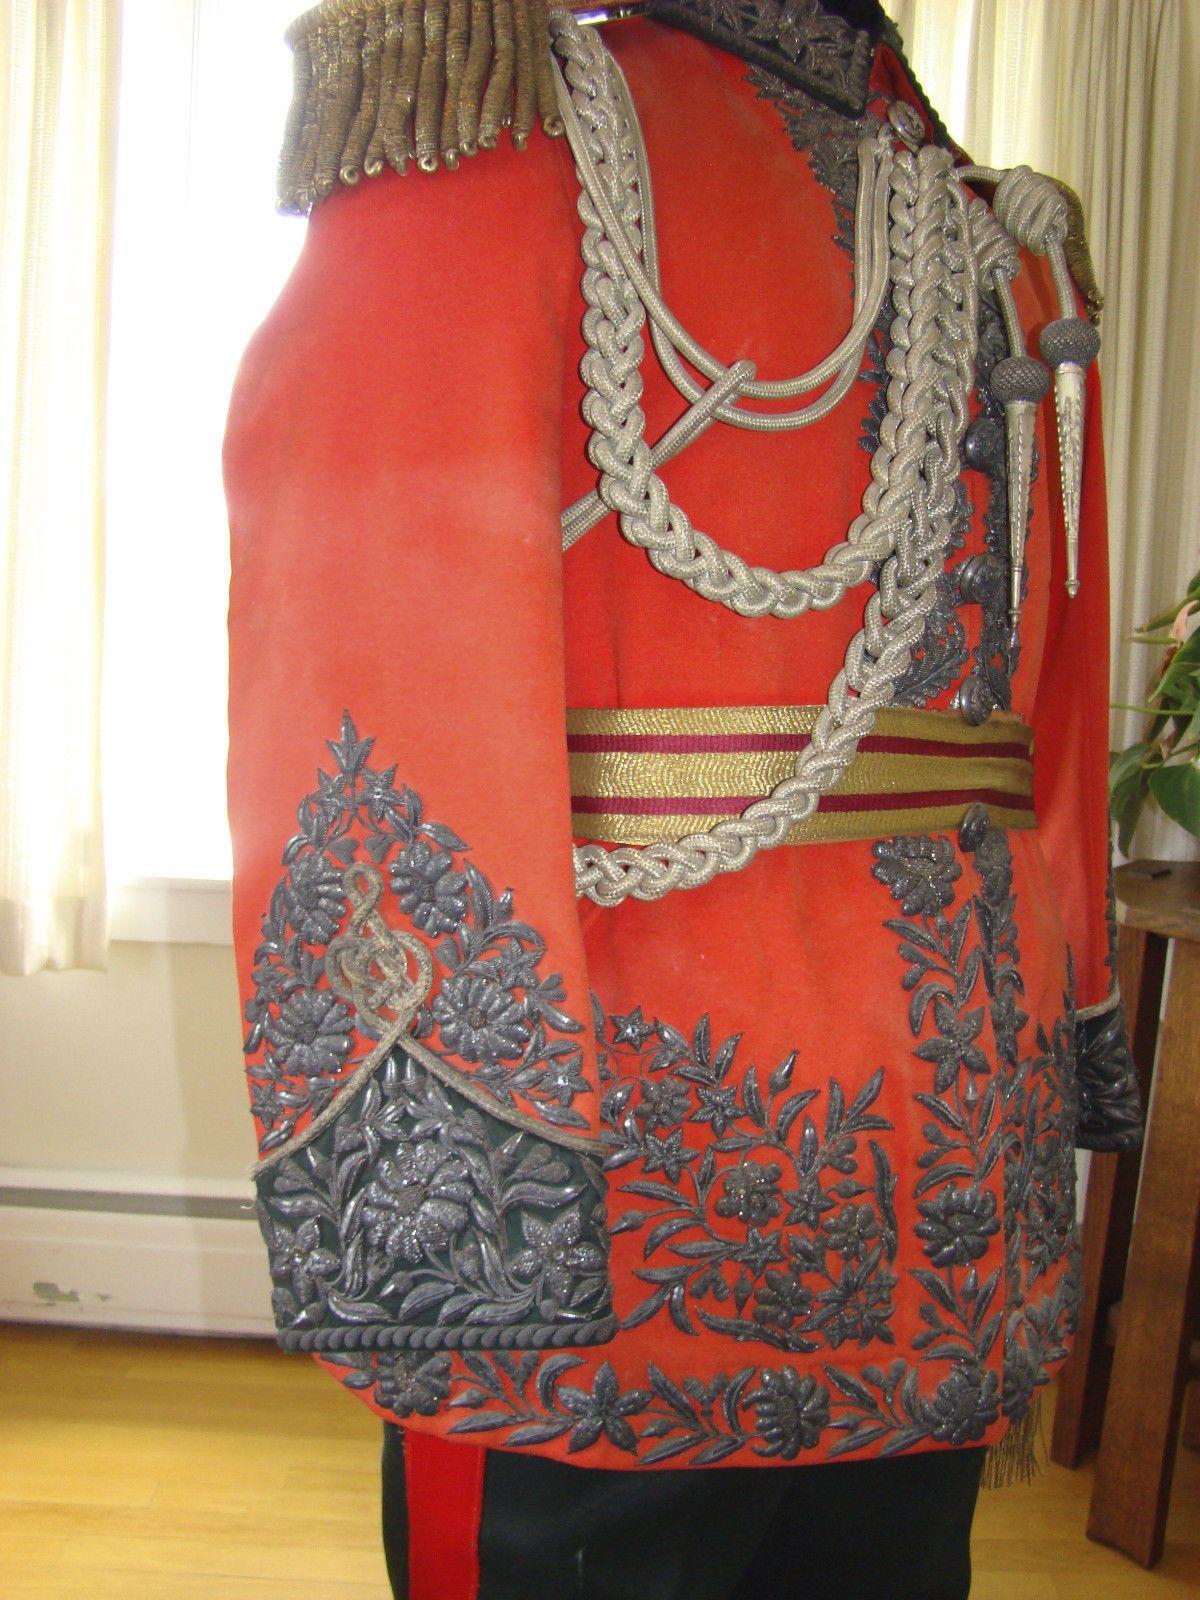 Ornate dress uniform colinchief gurkhas king of nepal victoria